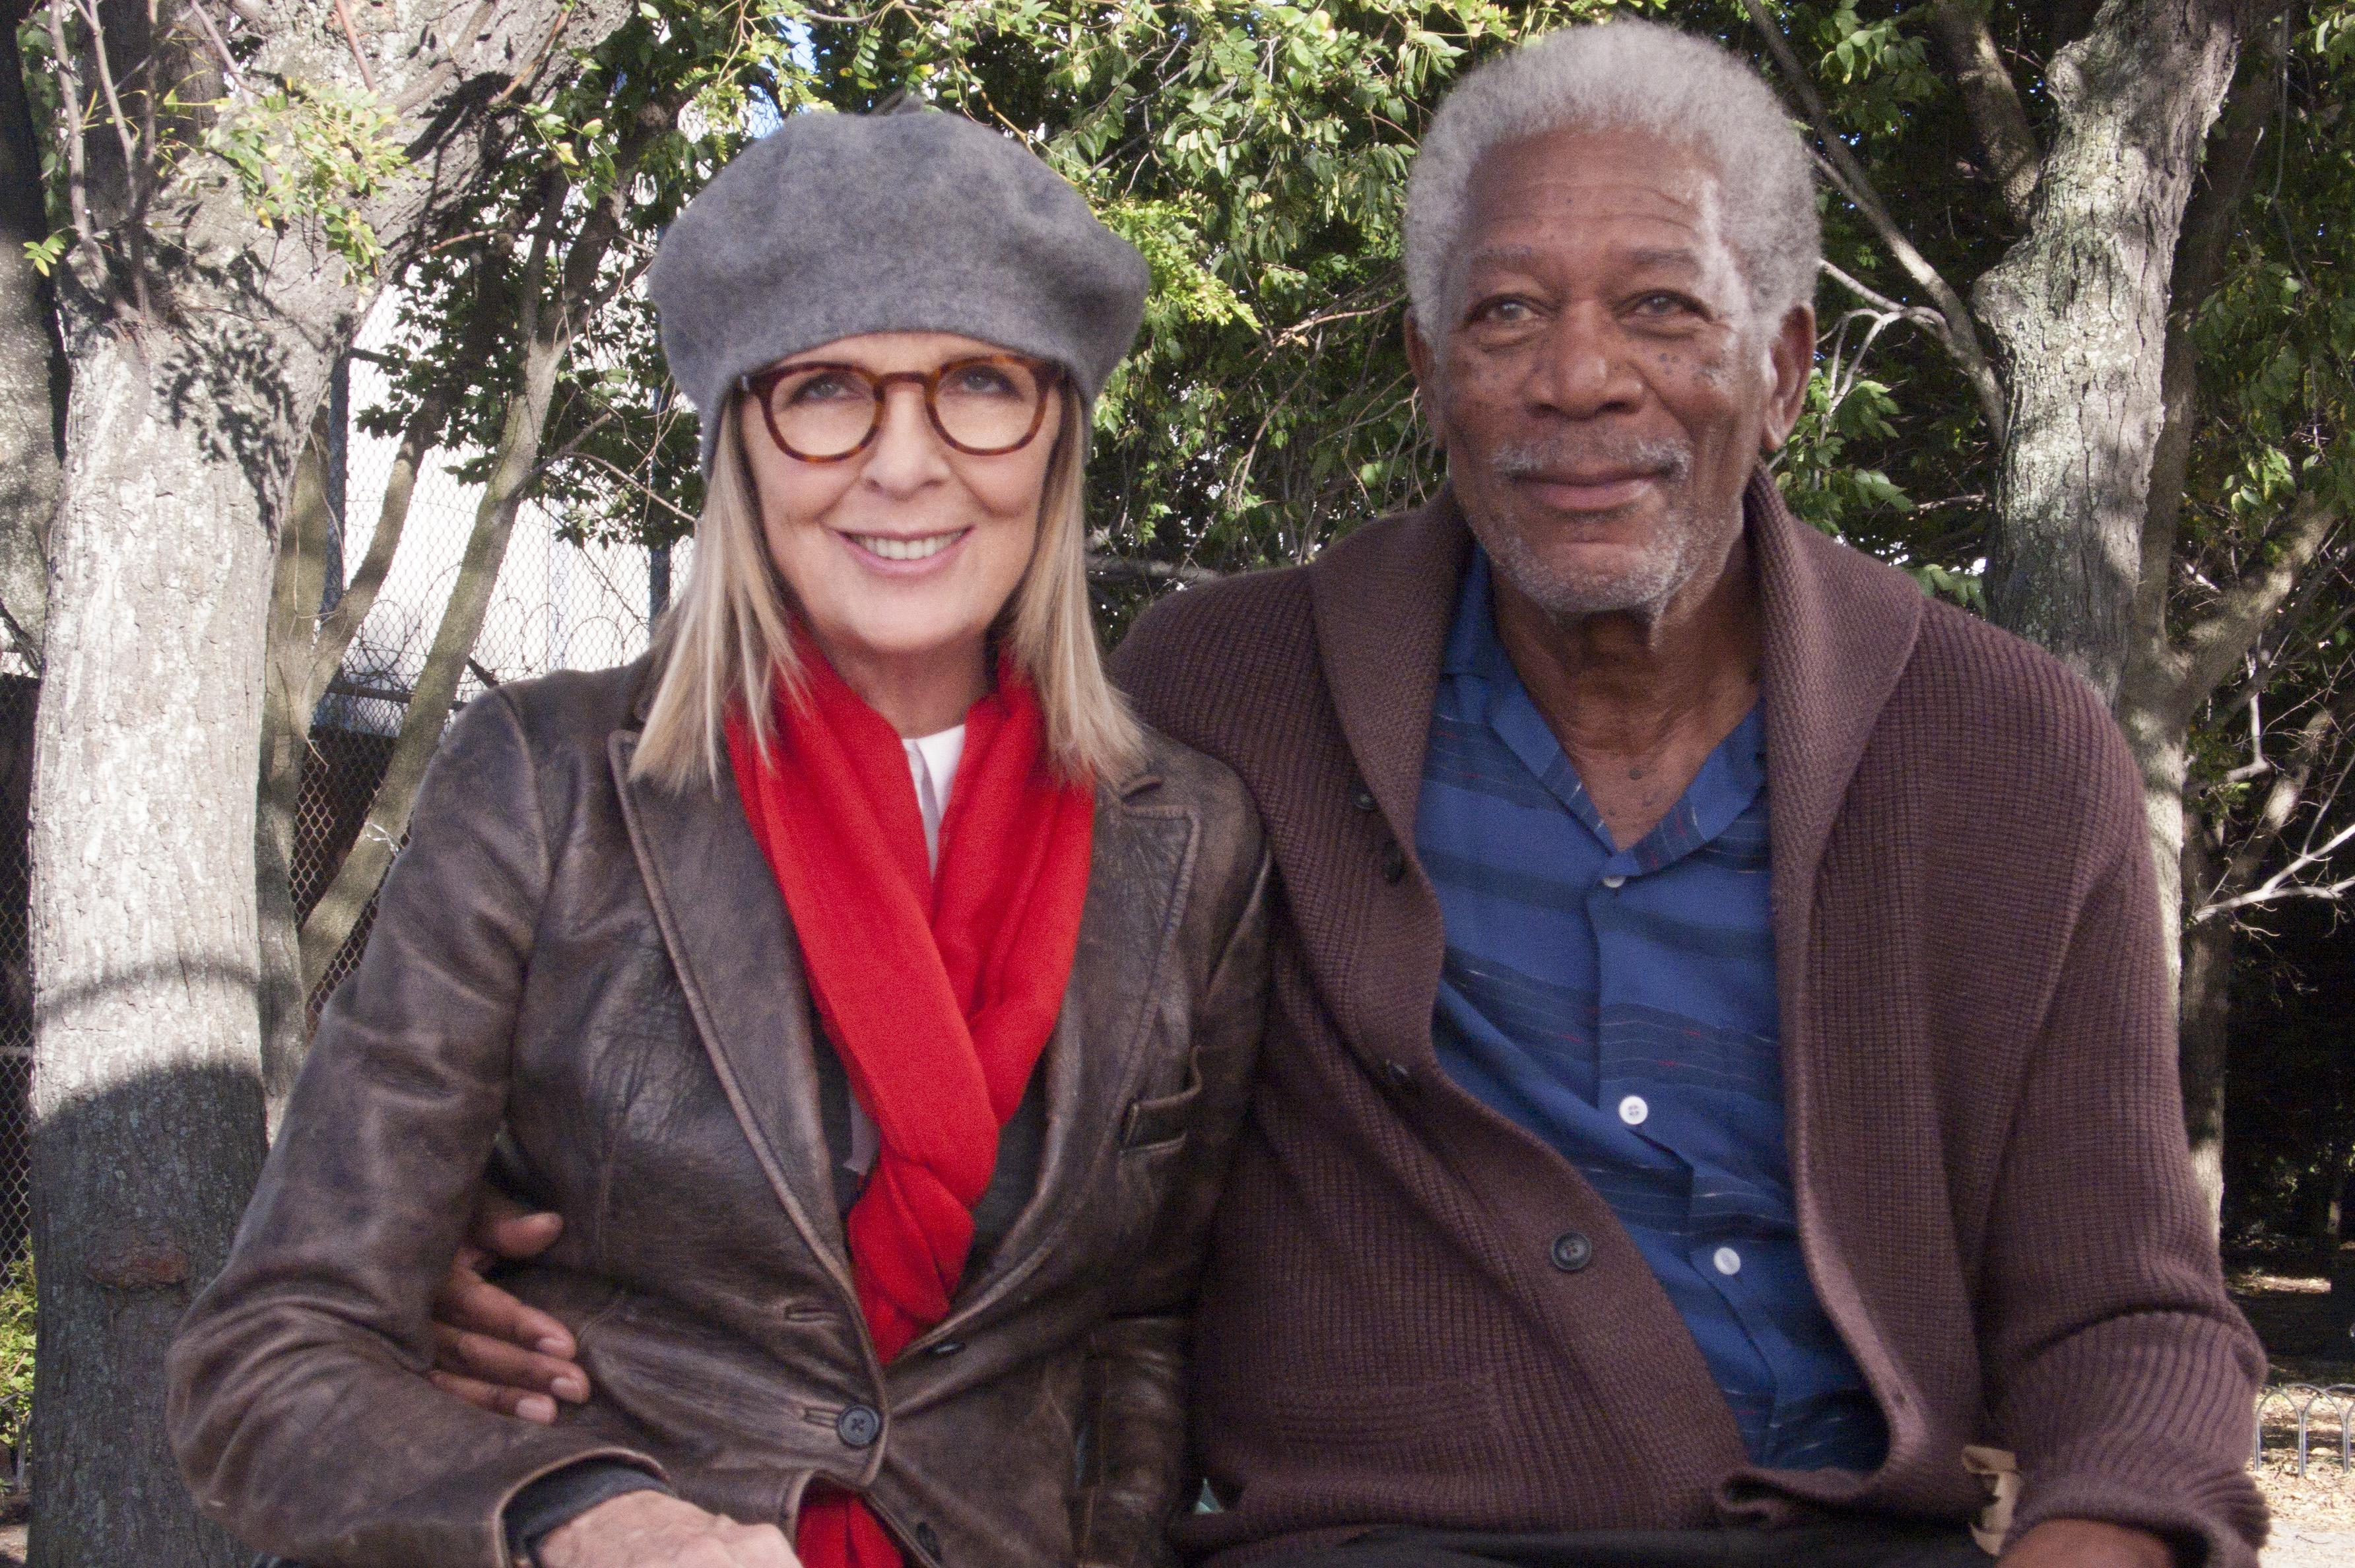 Morgan Freeman Diane Keaton And Director Richard Loncraine Talk 5 Flights Up Blackfilm Com Black Movies Television And Theatre News